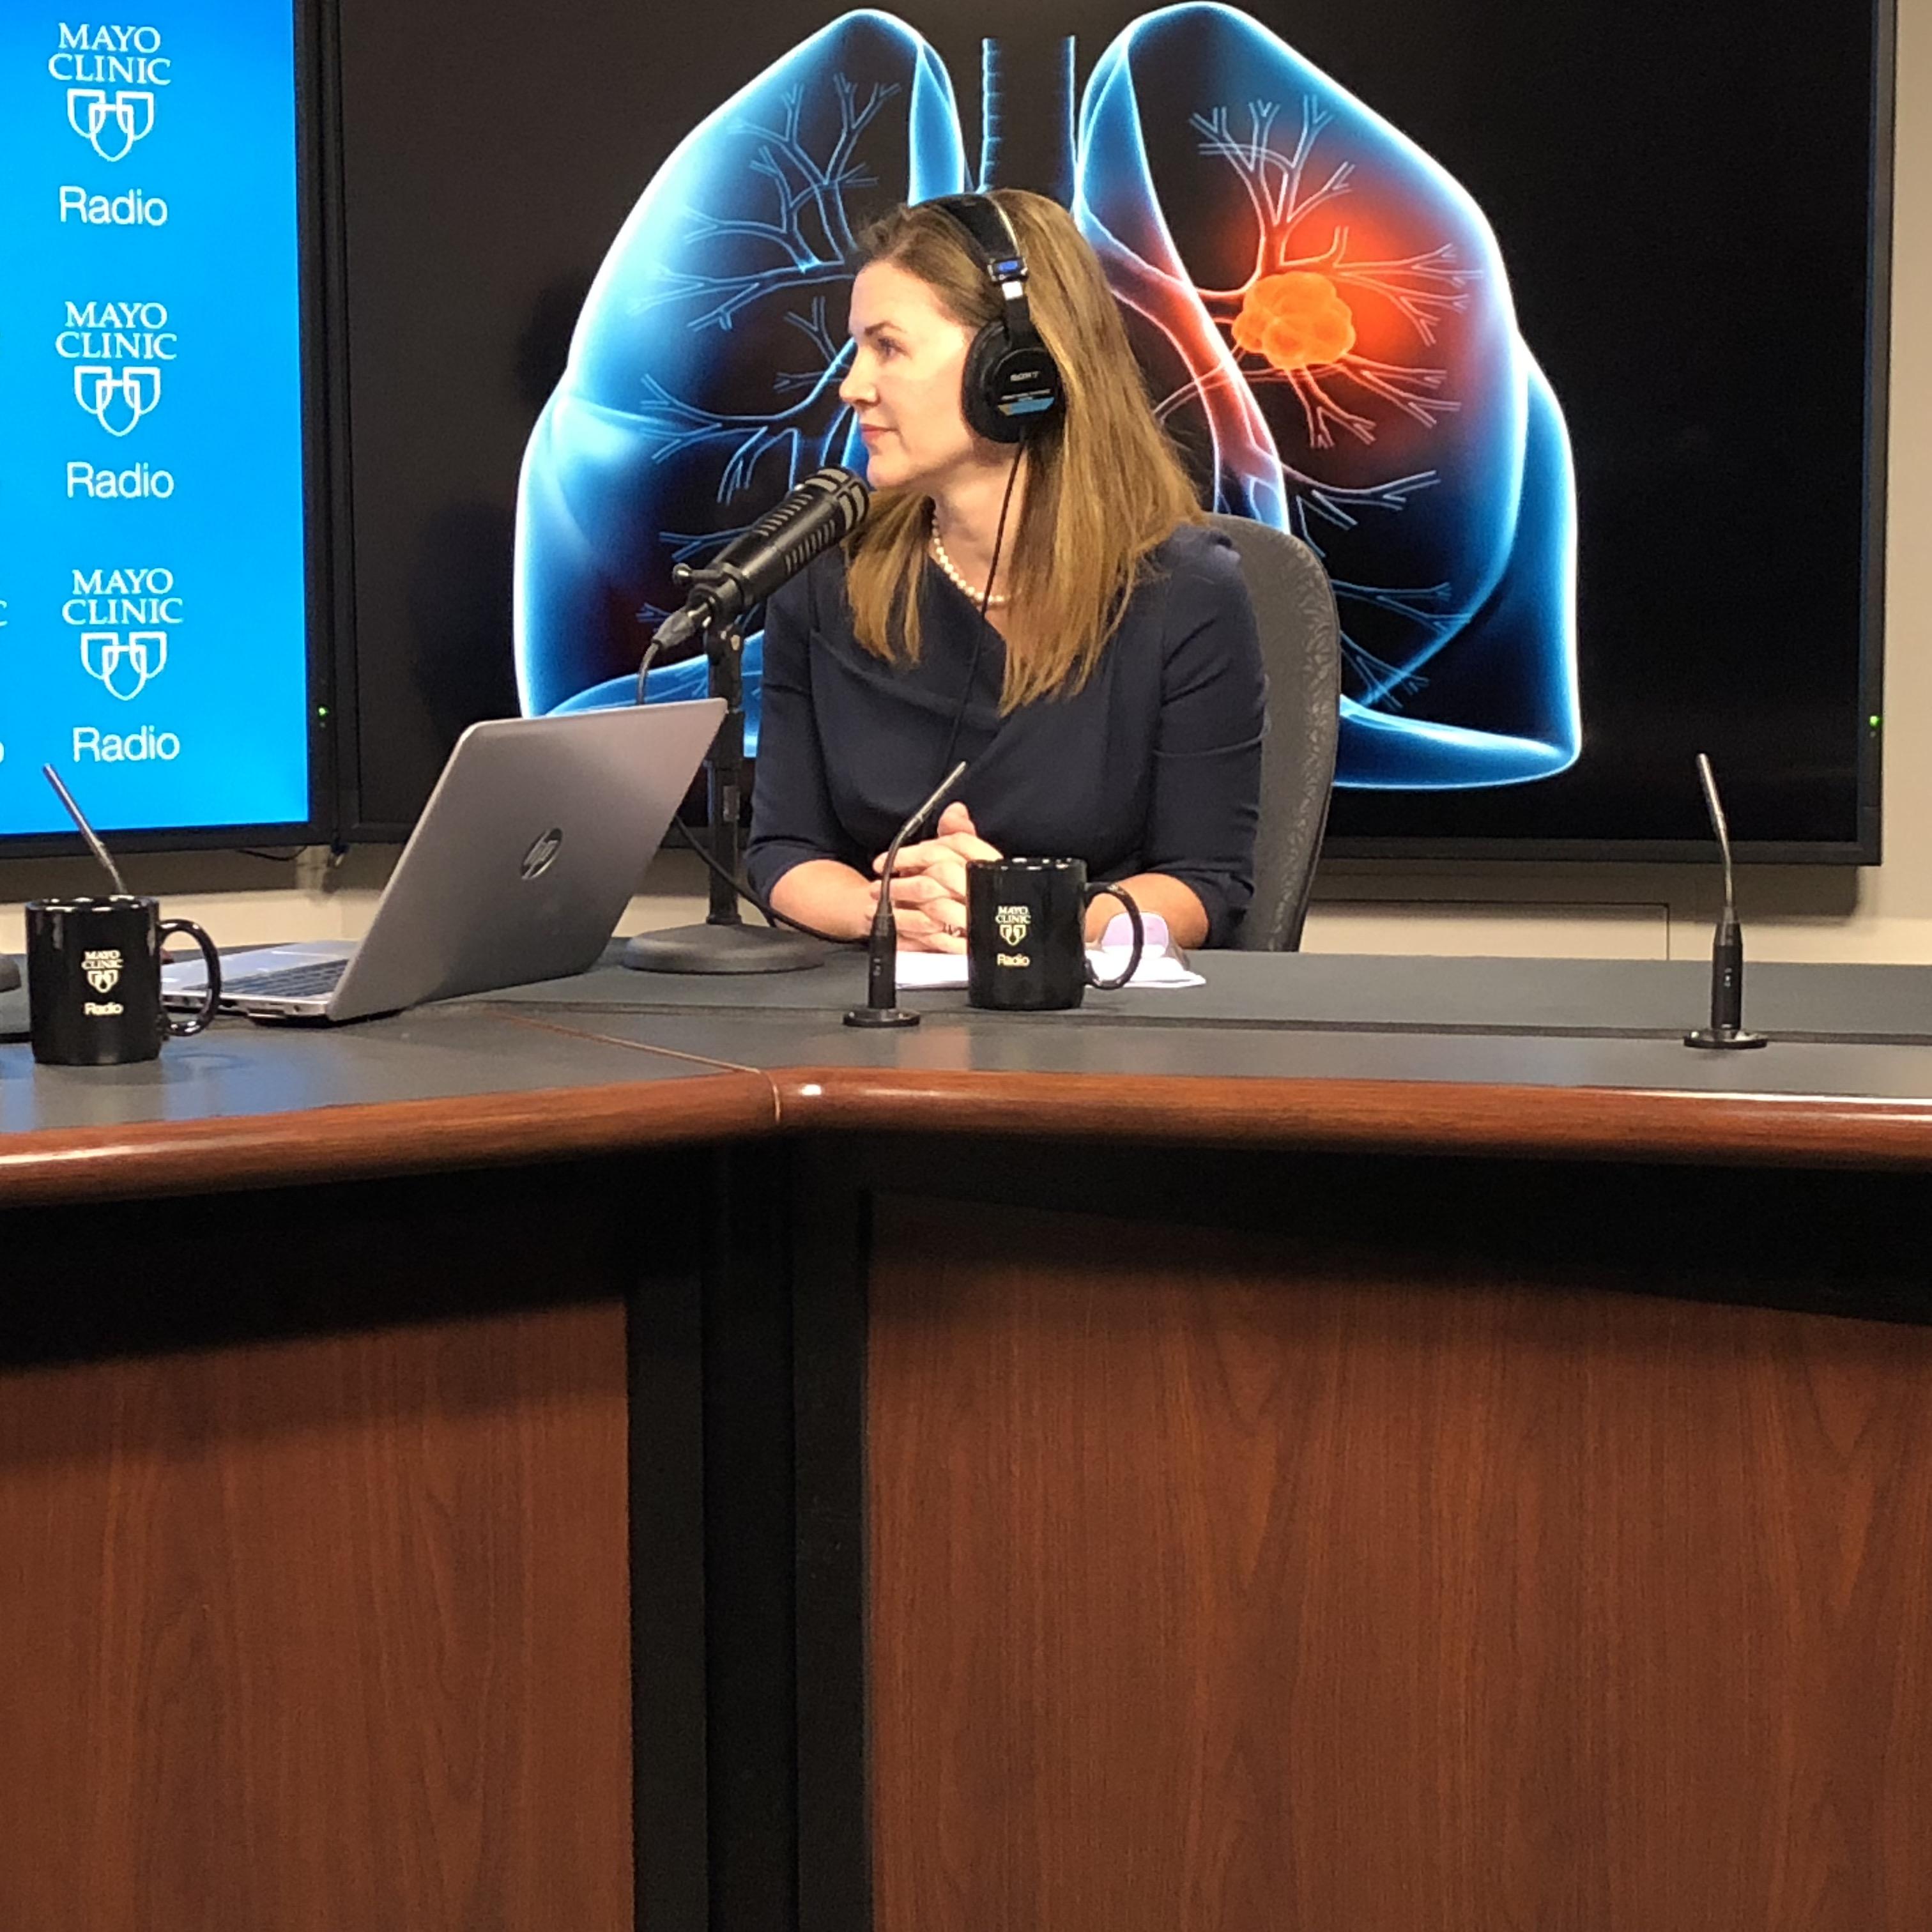 Dr. Shanda Blackmon being interviewed on Mayo Clinic Radio